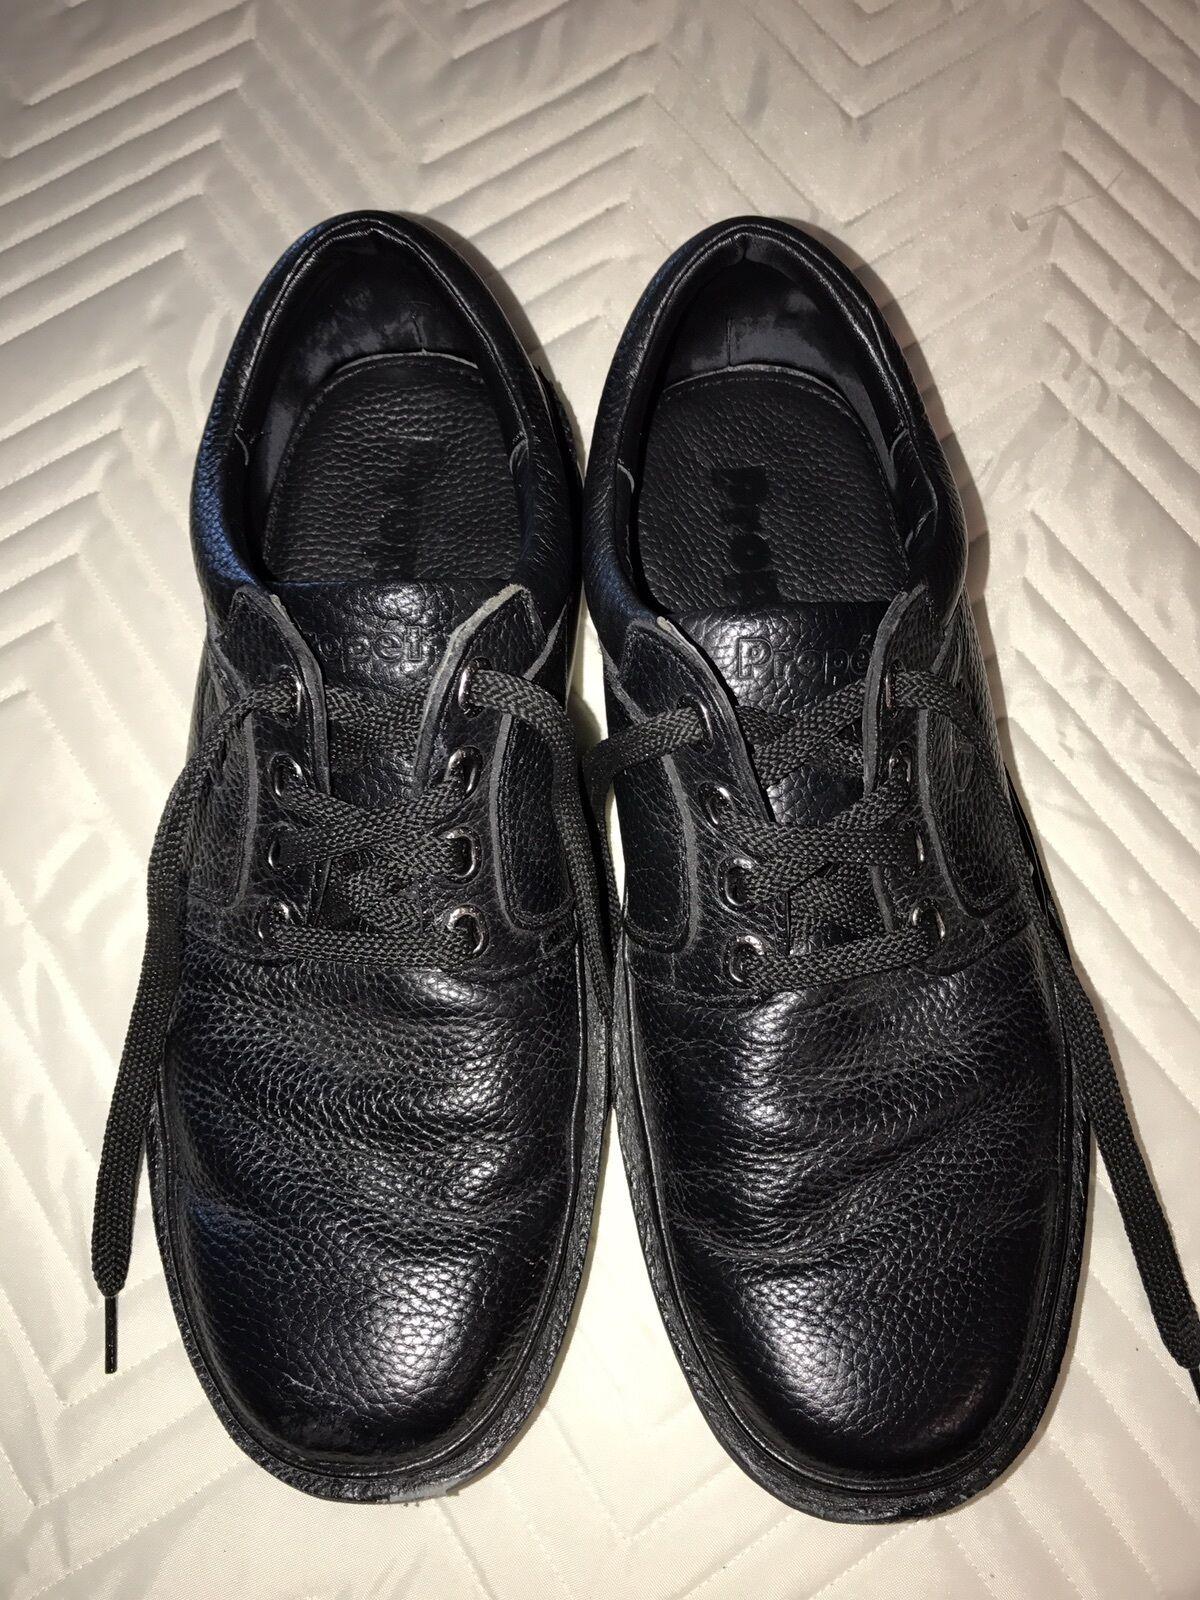 Men's Propet Shoes.  M4070 Black Leather SIZE 13 US.  Width MED(D).